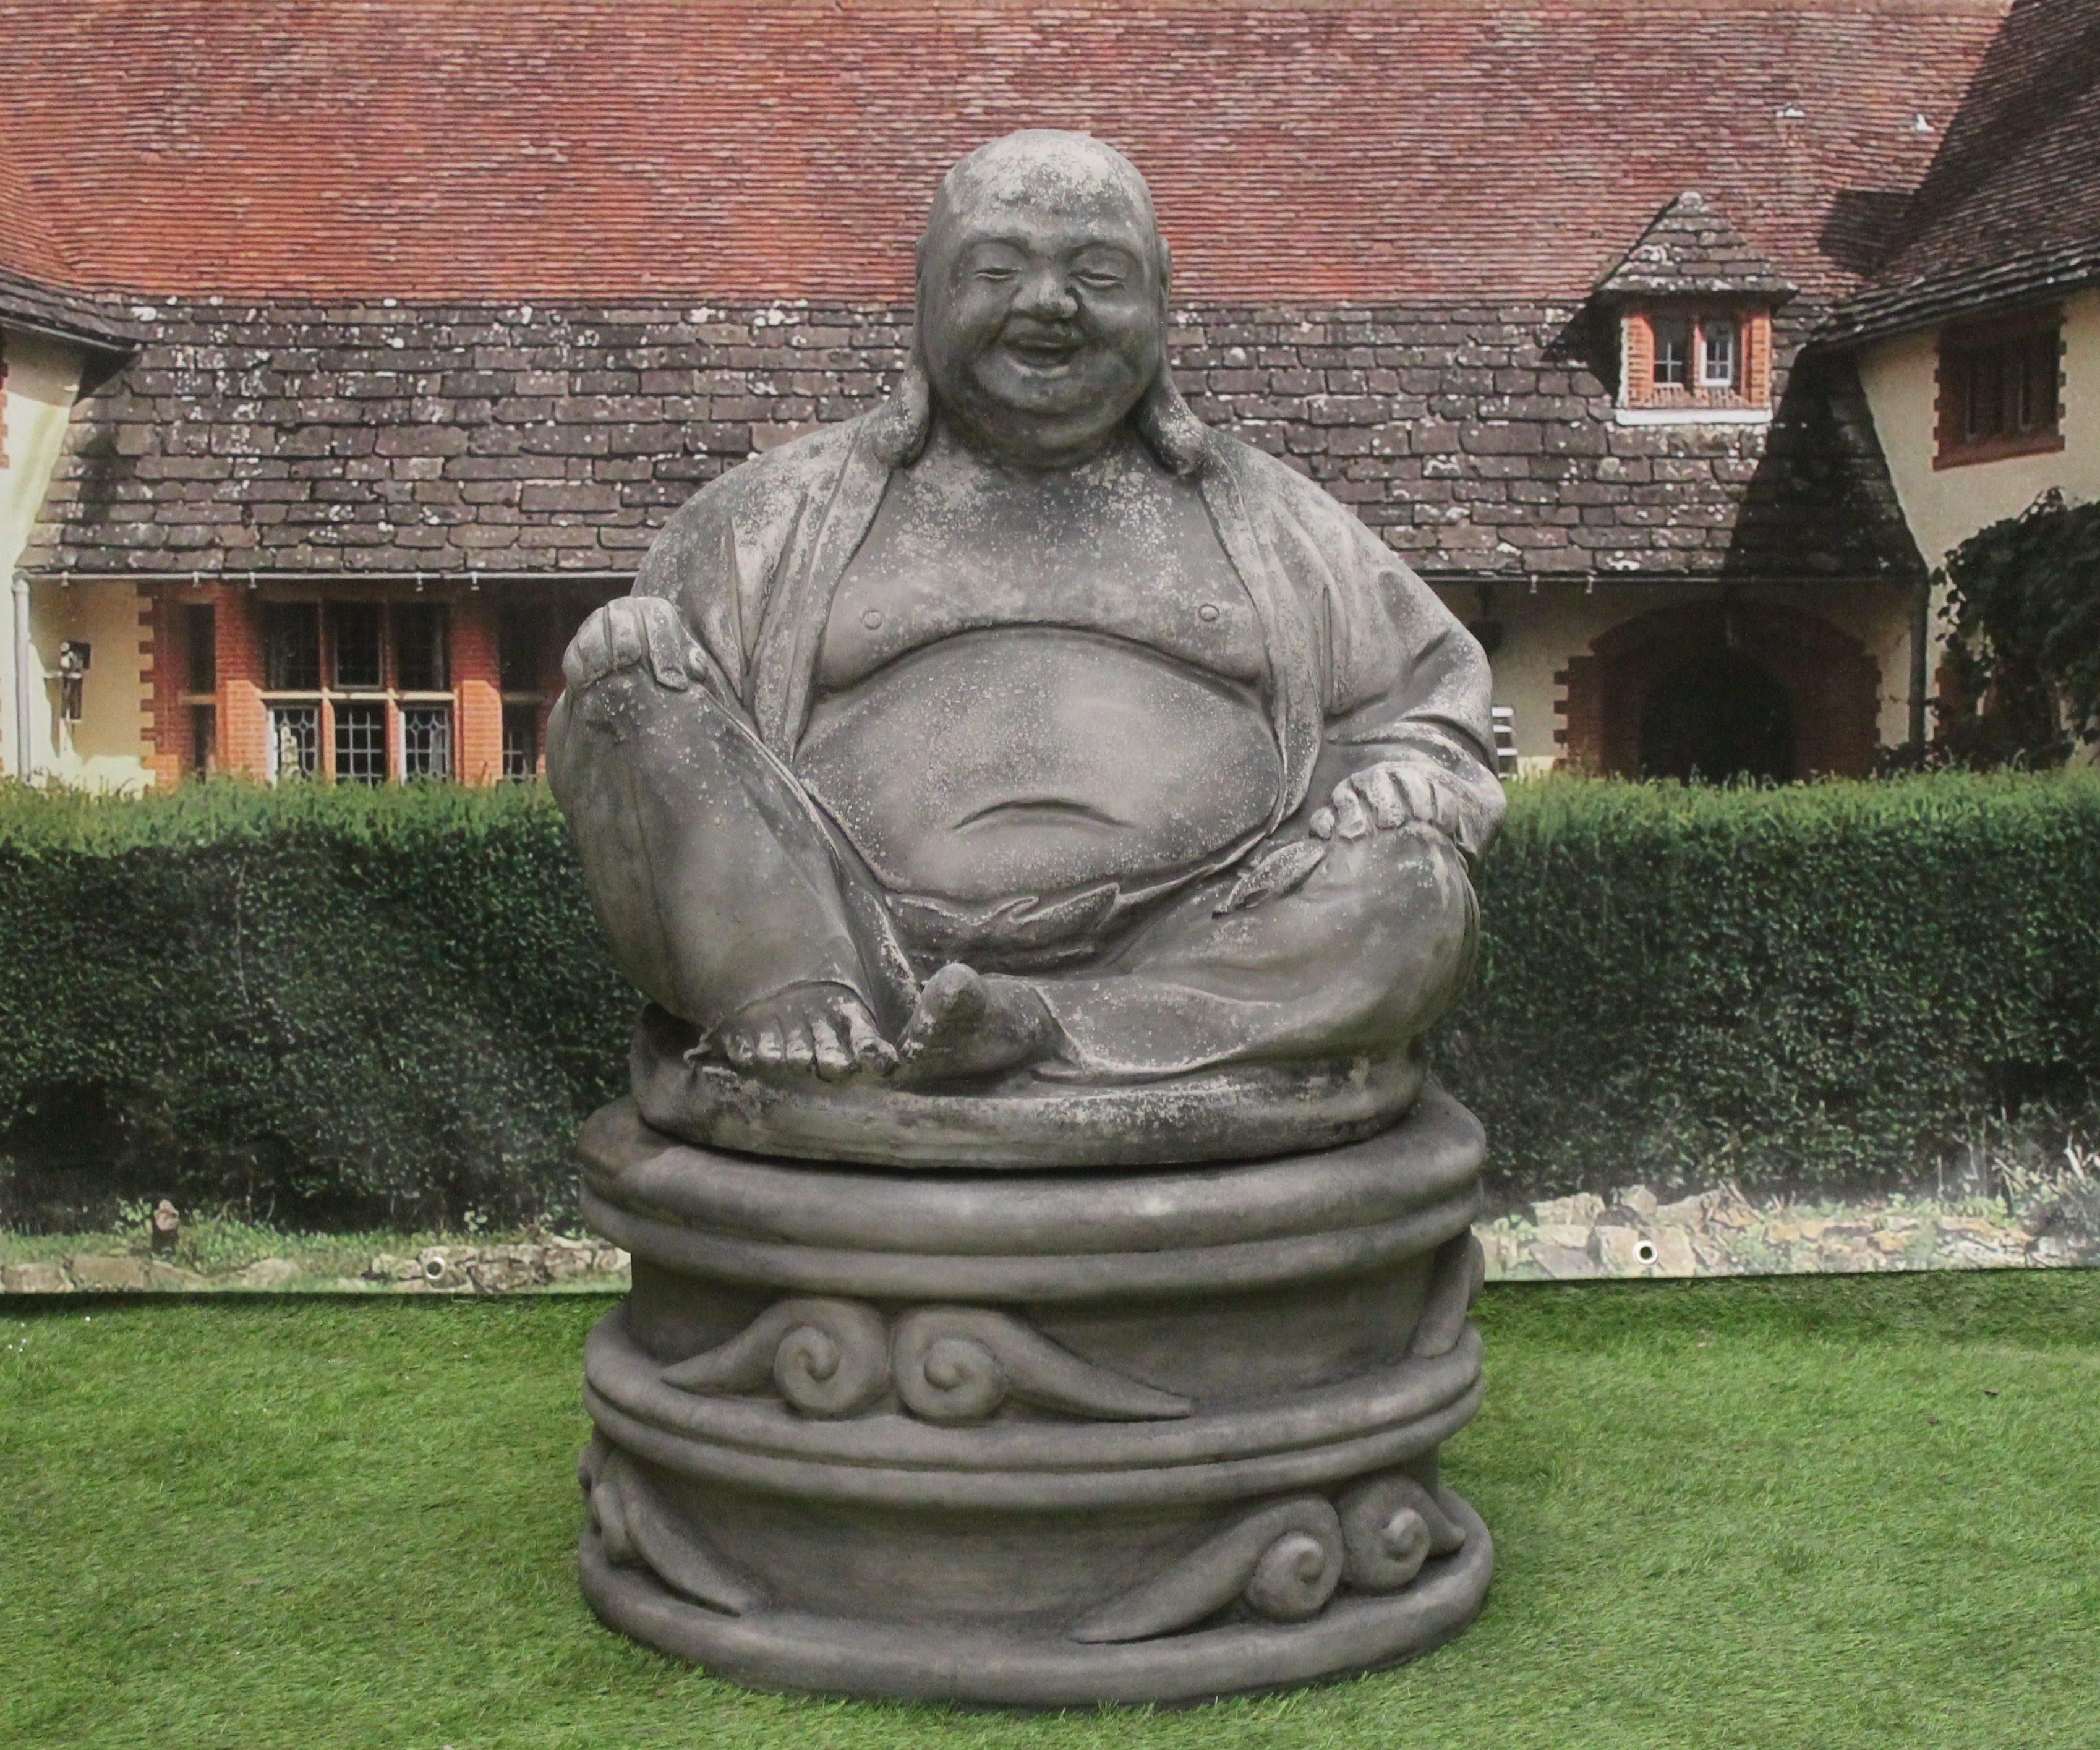 Massive Laughing Buddha Plinth Stone Garden Ornaments Garden Statues In Uk